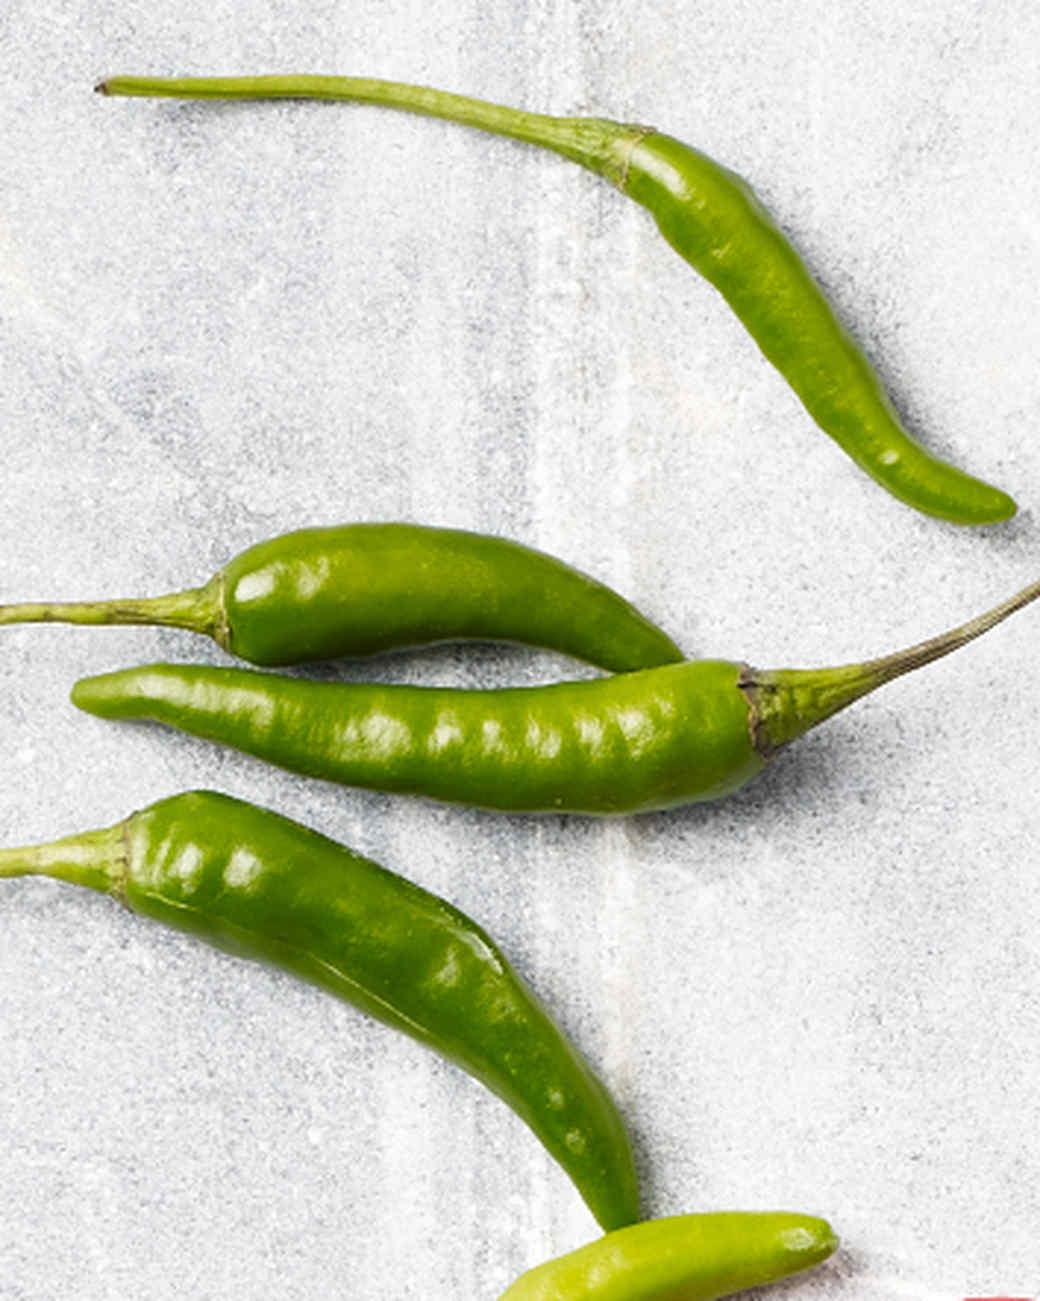 green-thai-peppers-154-1-d110163.jpg